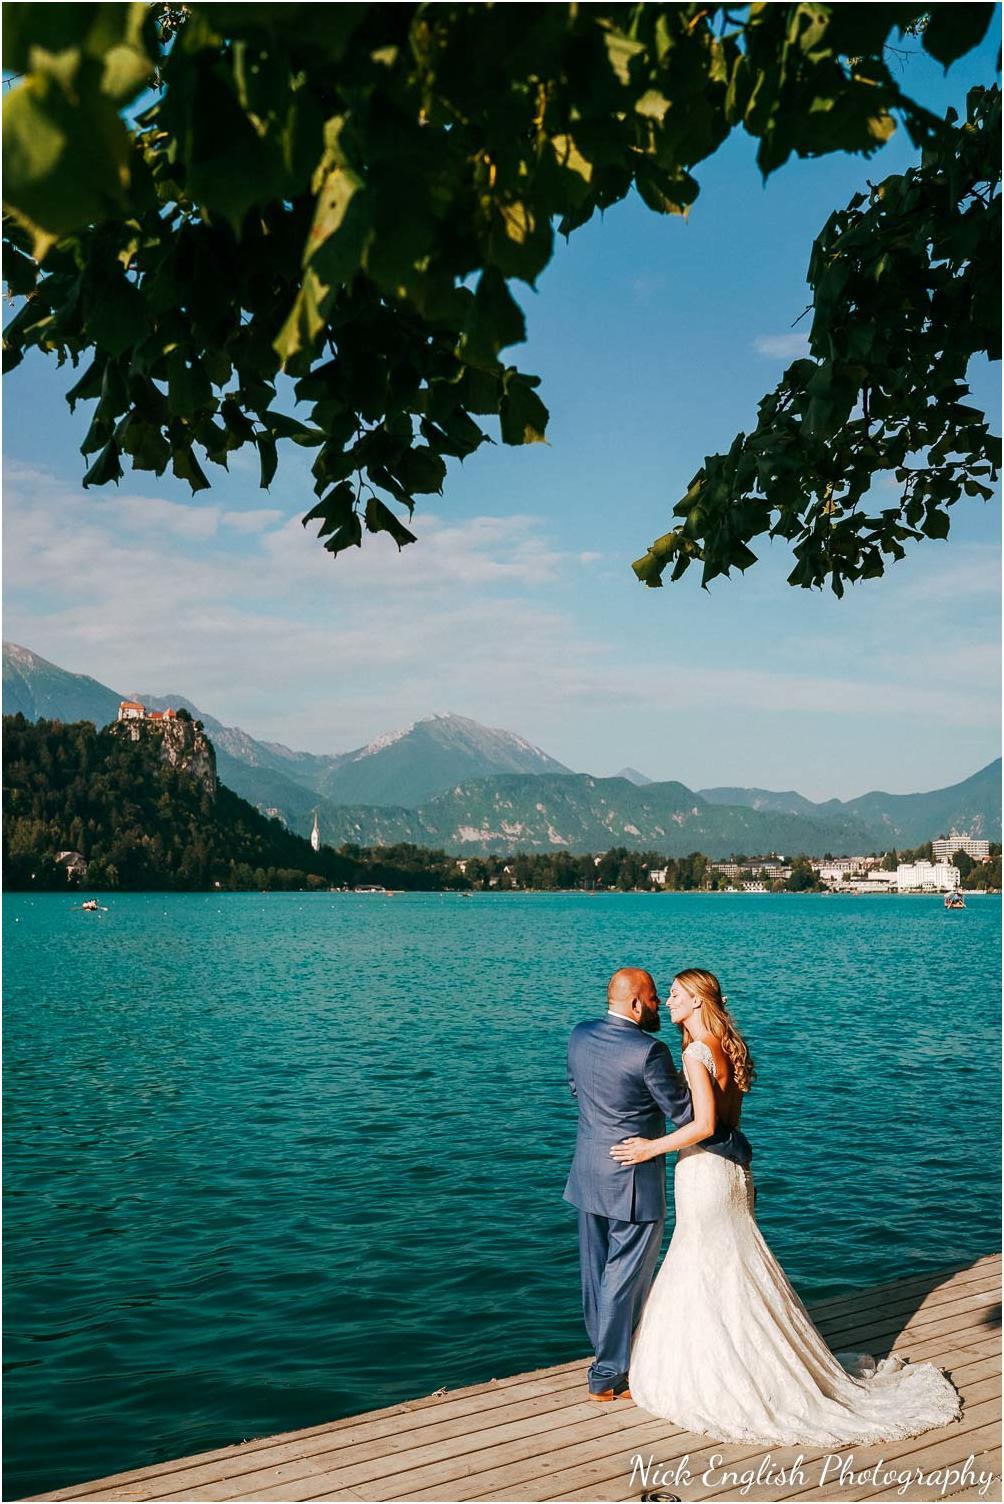 Destination_Wedding_Photographer_Slovenia_Nick_English_Photography-70-24.jpg